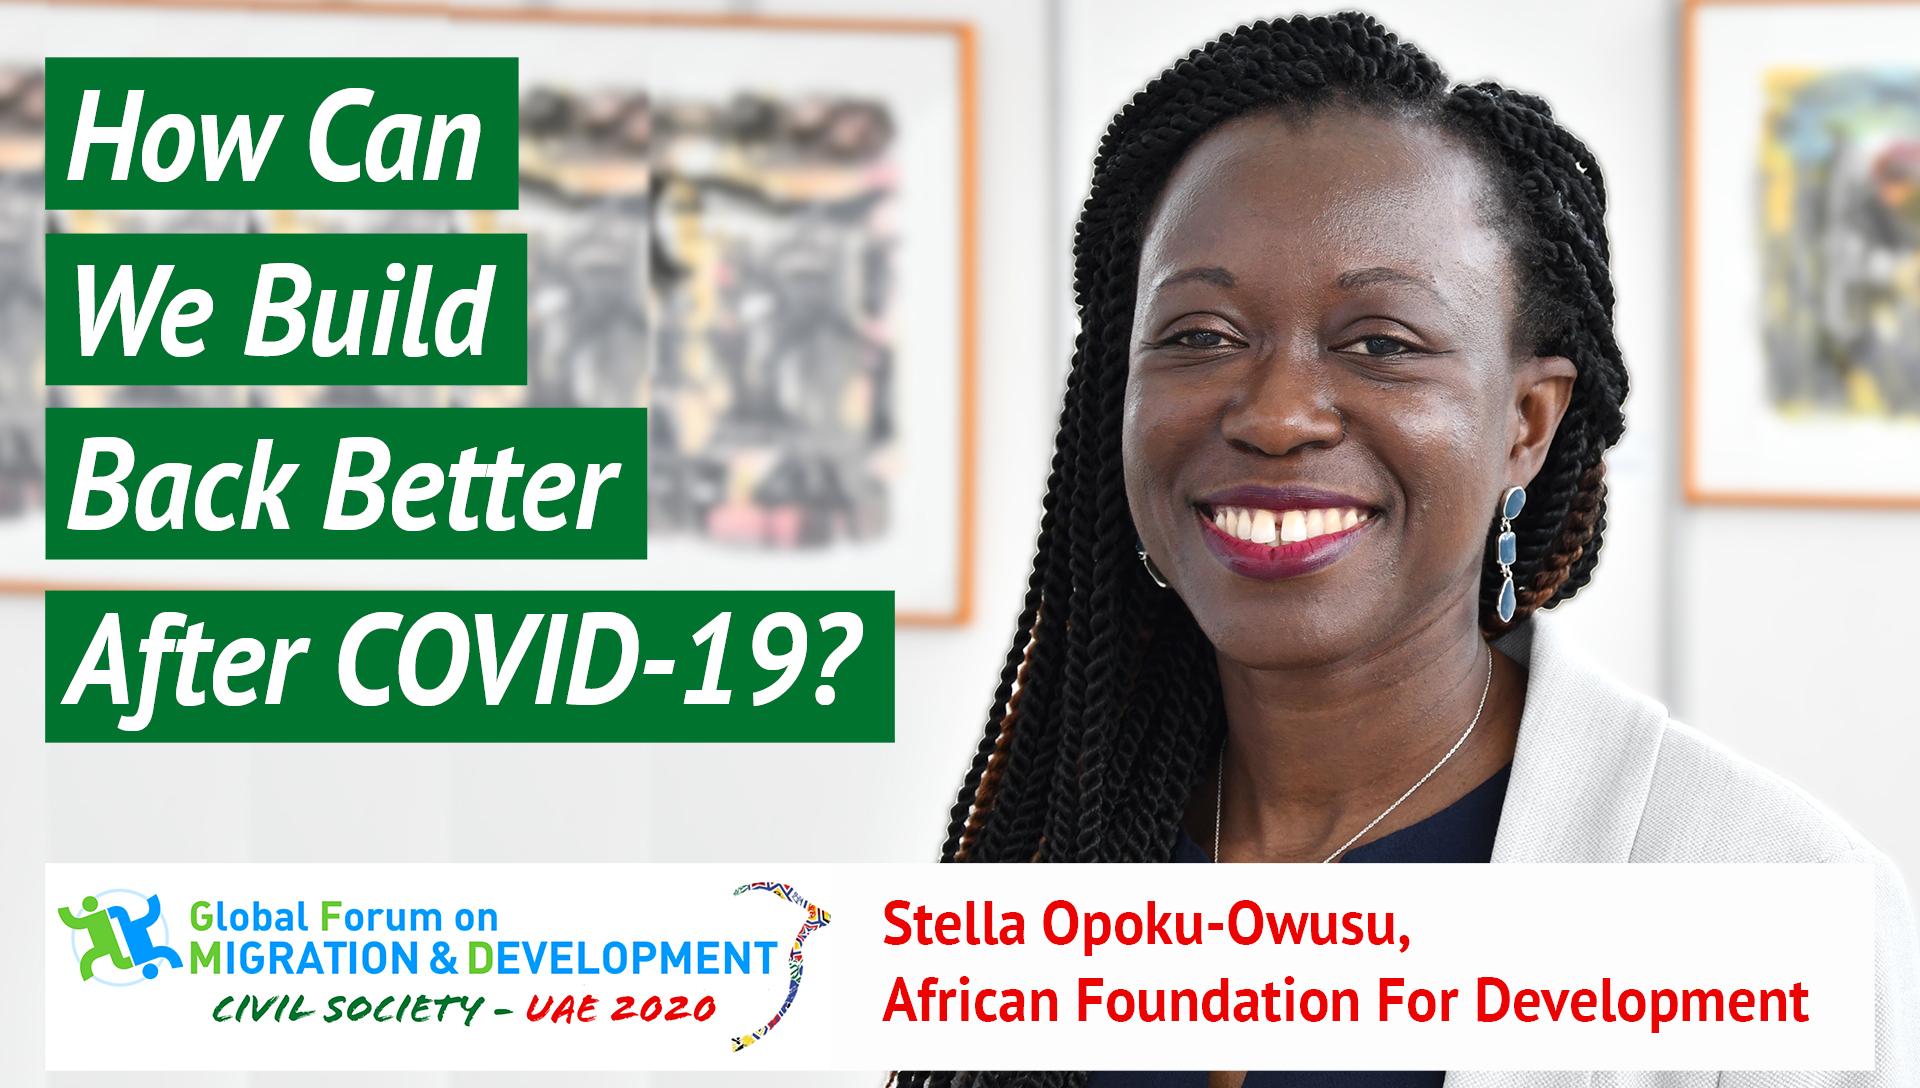 VIDEO-thumbnail-Stella-Opoku-Owusu-2020-